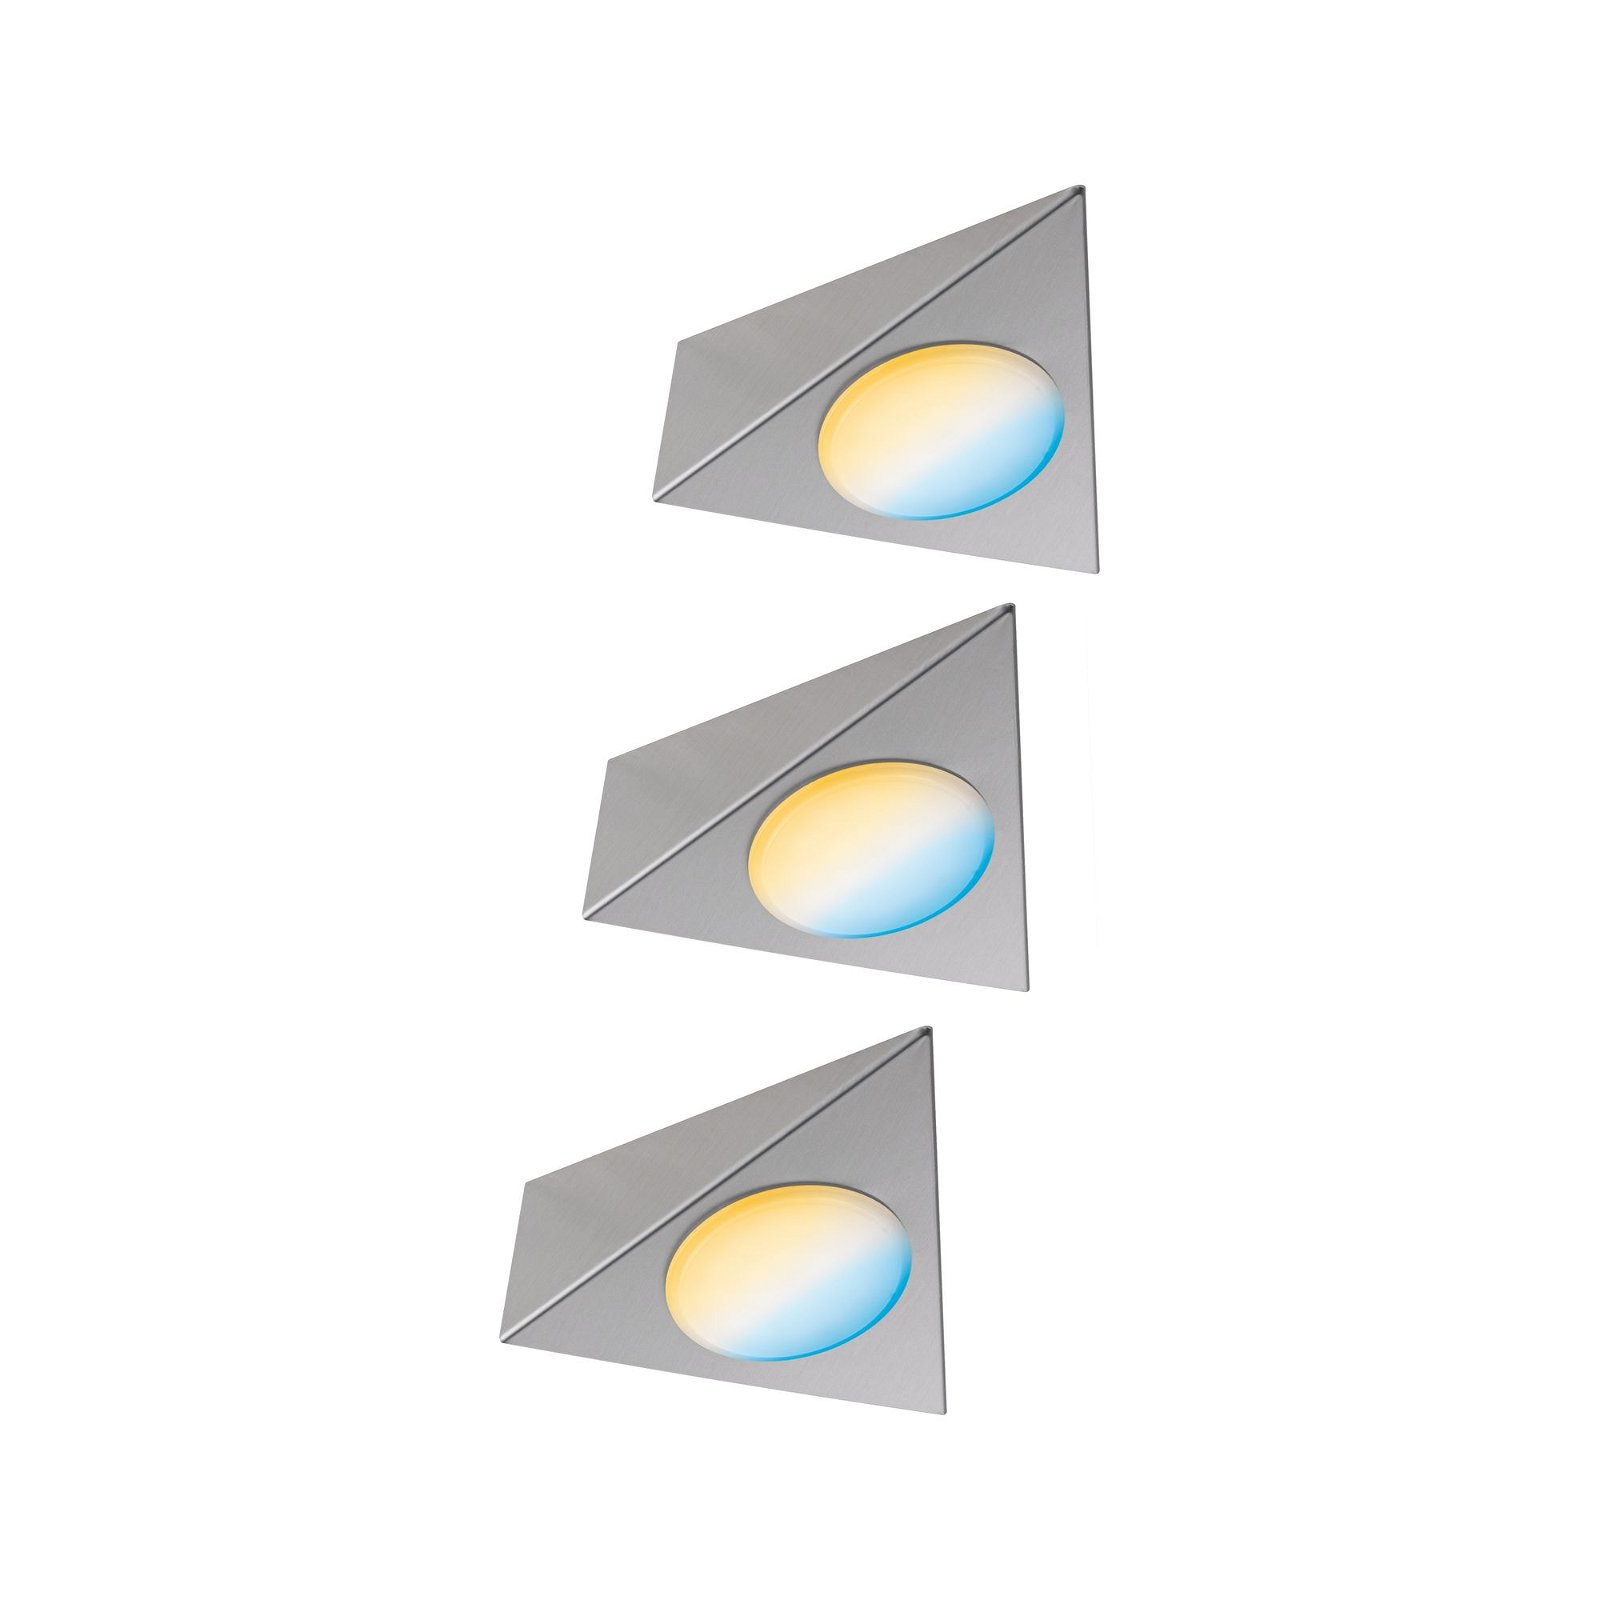 Clever Connect LED Spot Trigo Tunable White 3x2,1W 12VA Nickel gebürstet